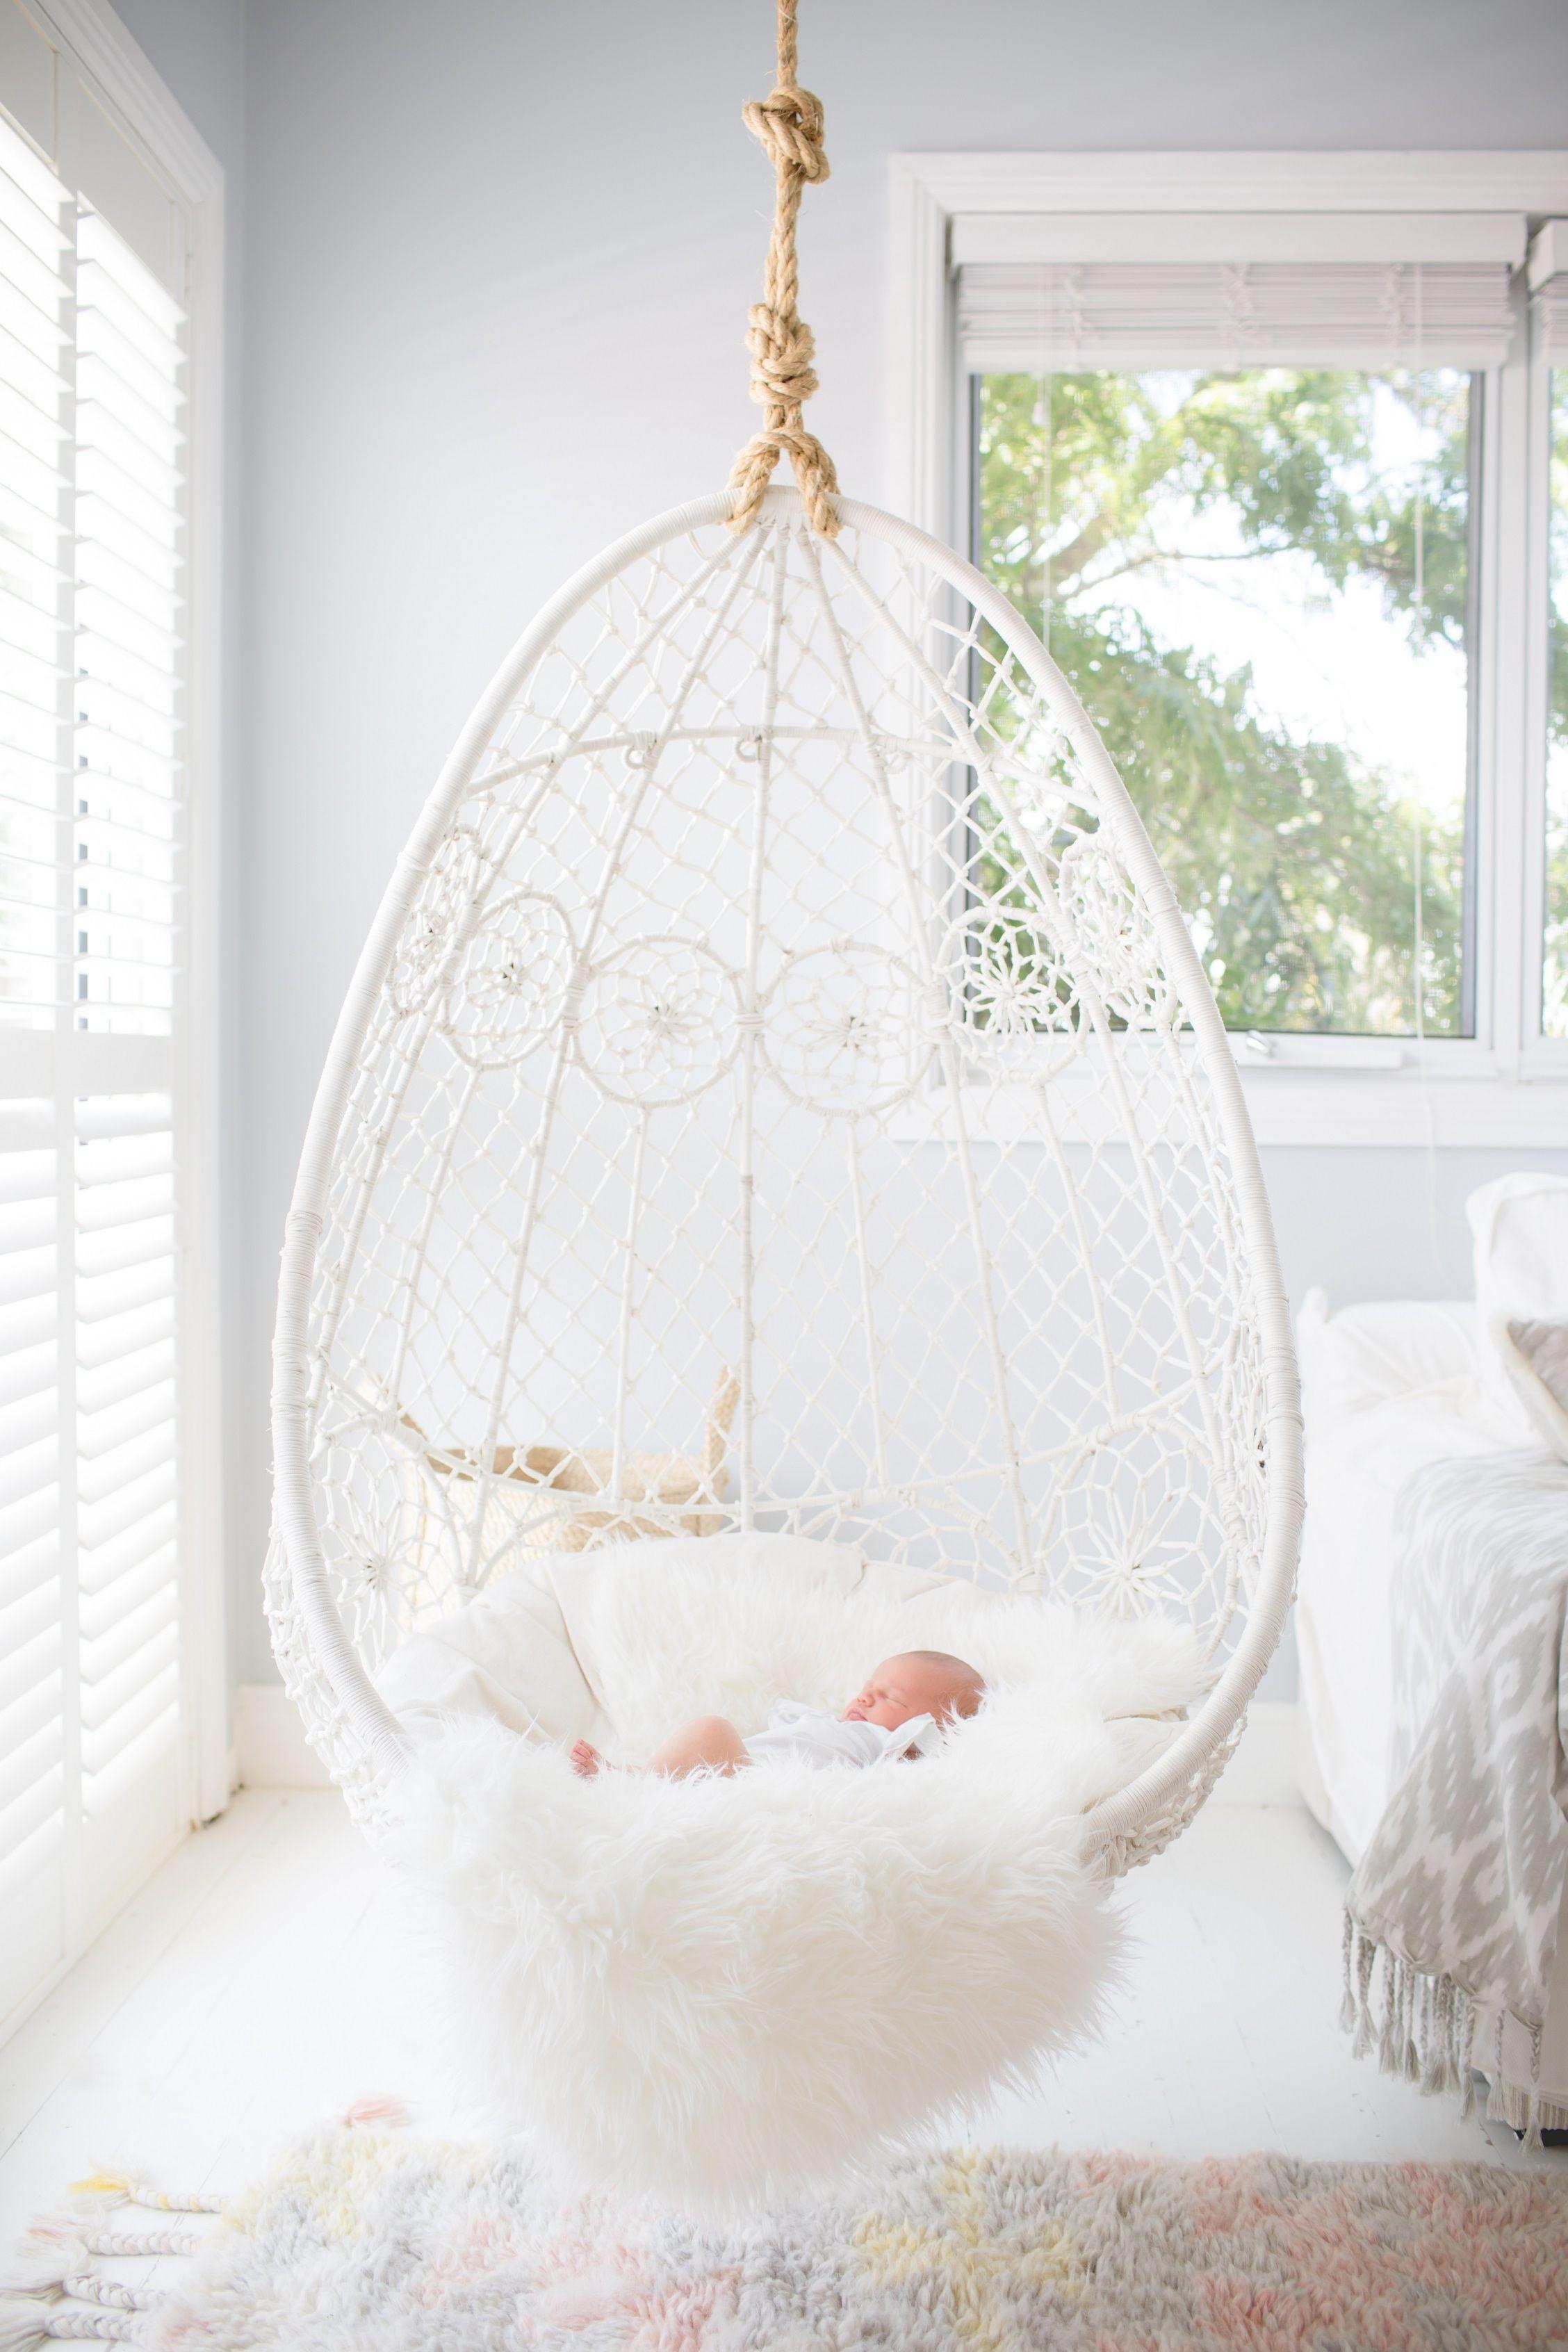 Macrame Swing Chair Best Of Bedroom Cool Hanging Swing